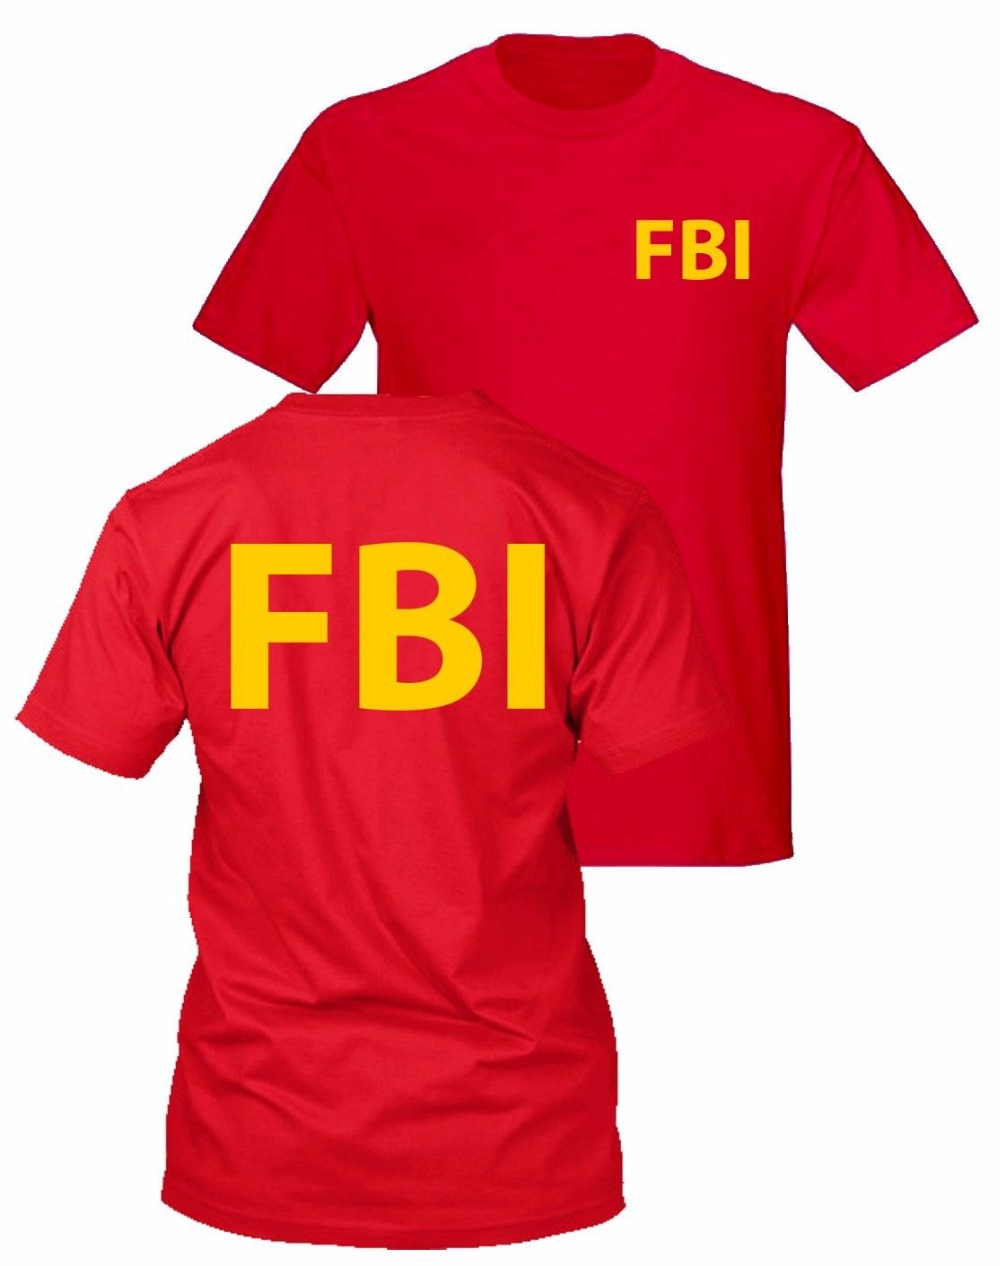 FBI t-shirt secret service CIA t-shirt police government agent t-shirt